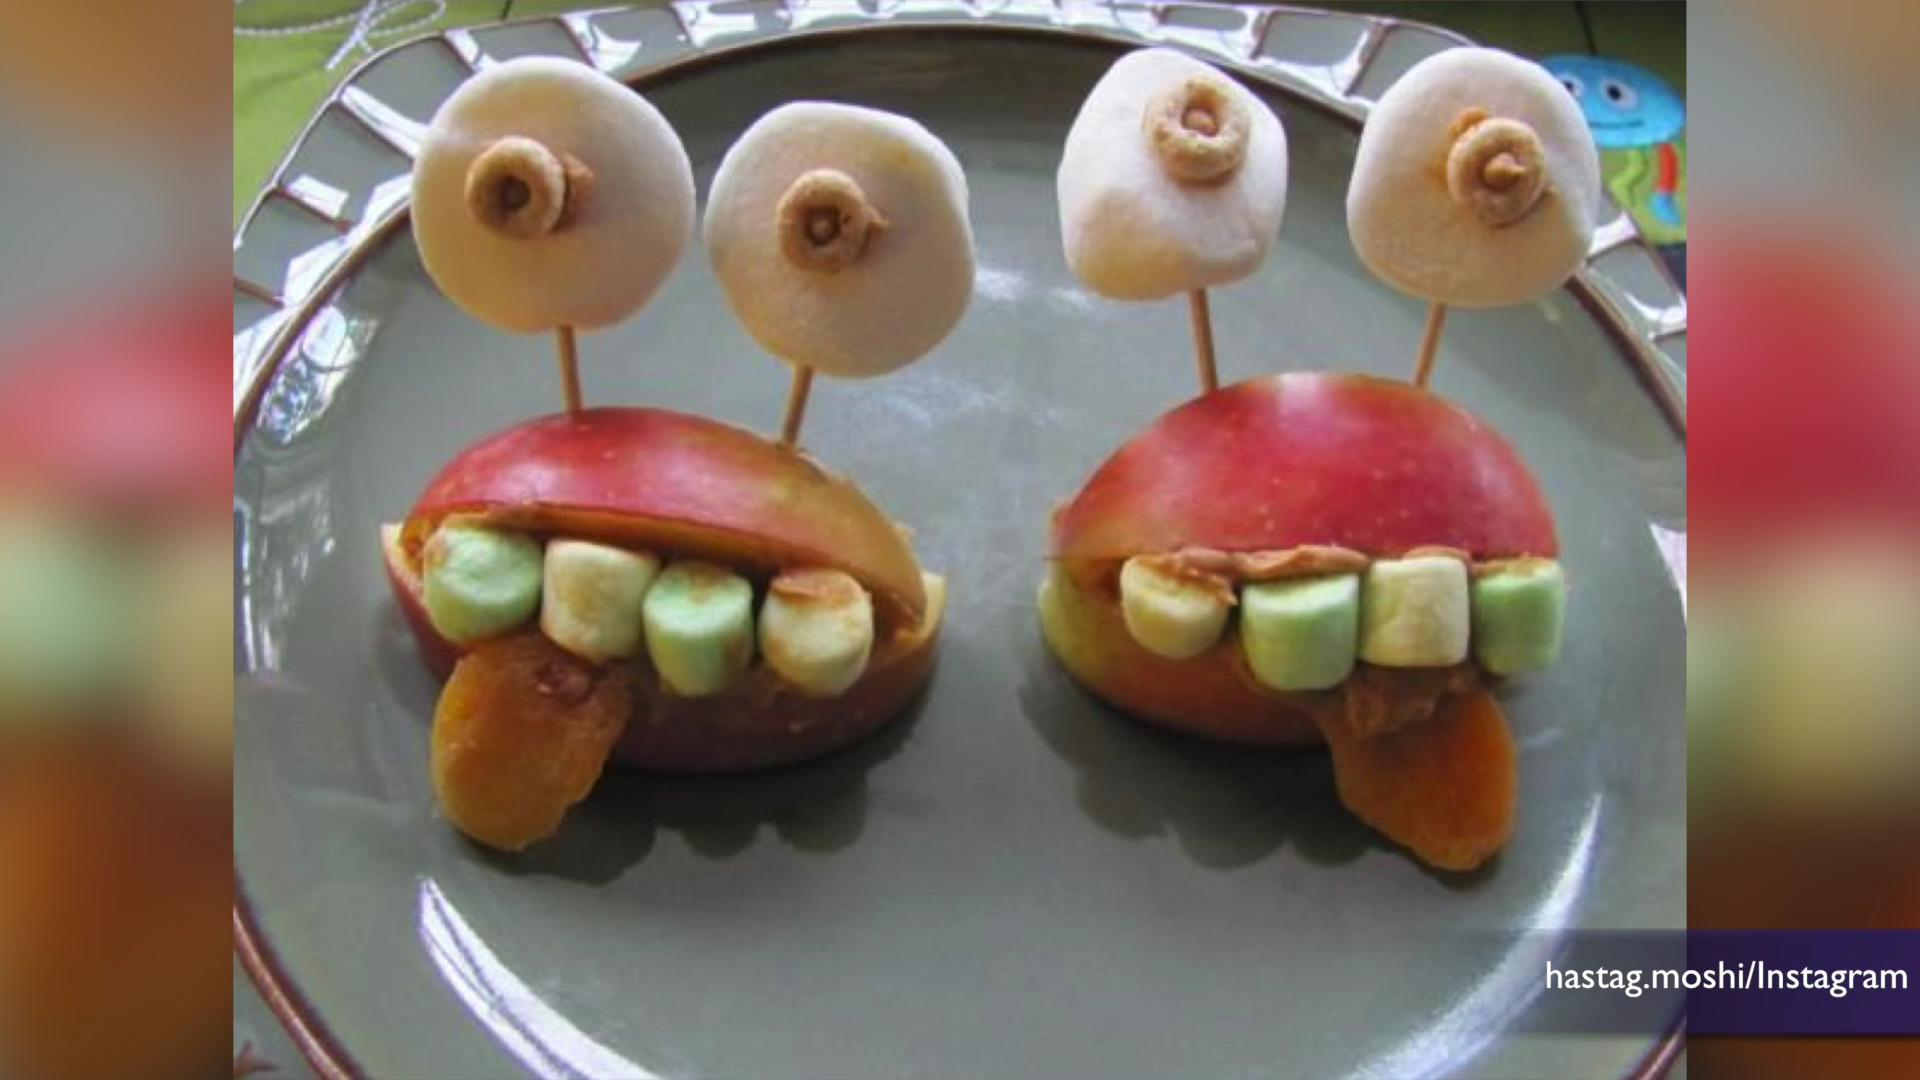 Easy No-Bake Halloween-Themed Snacks